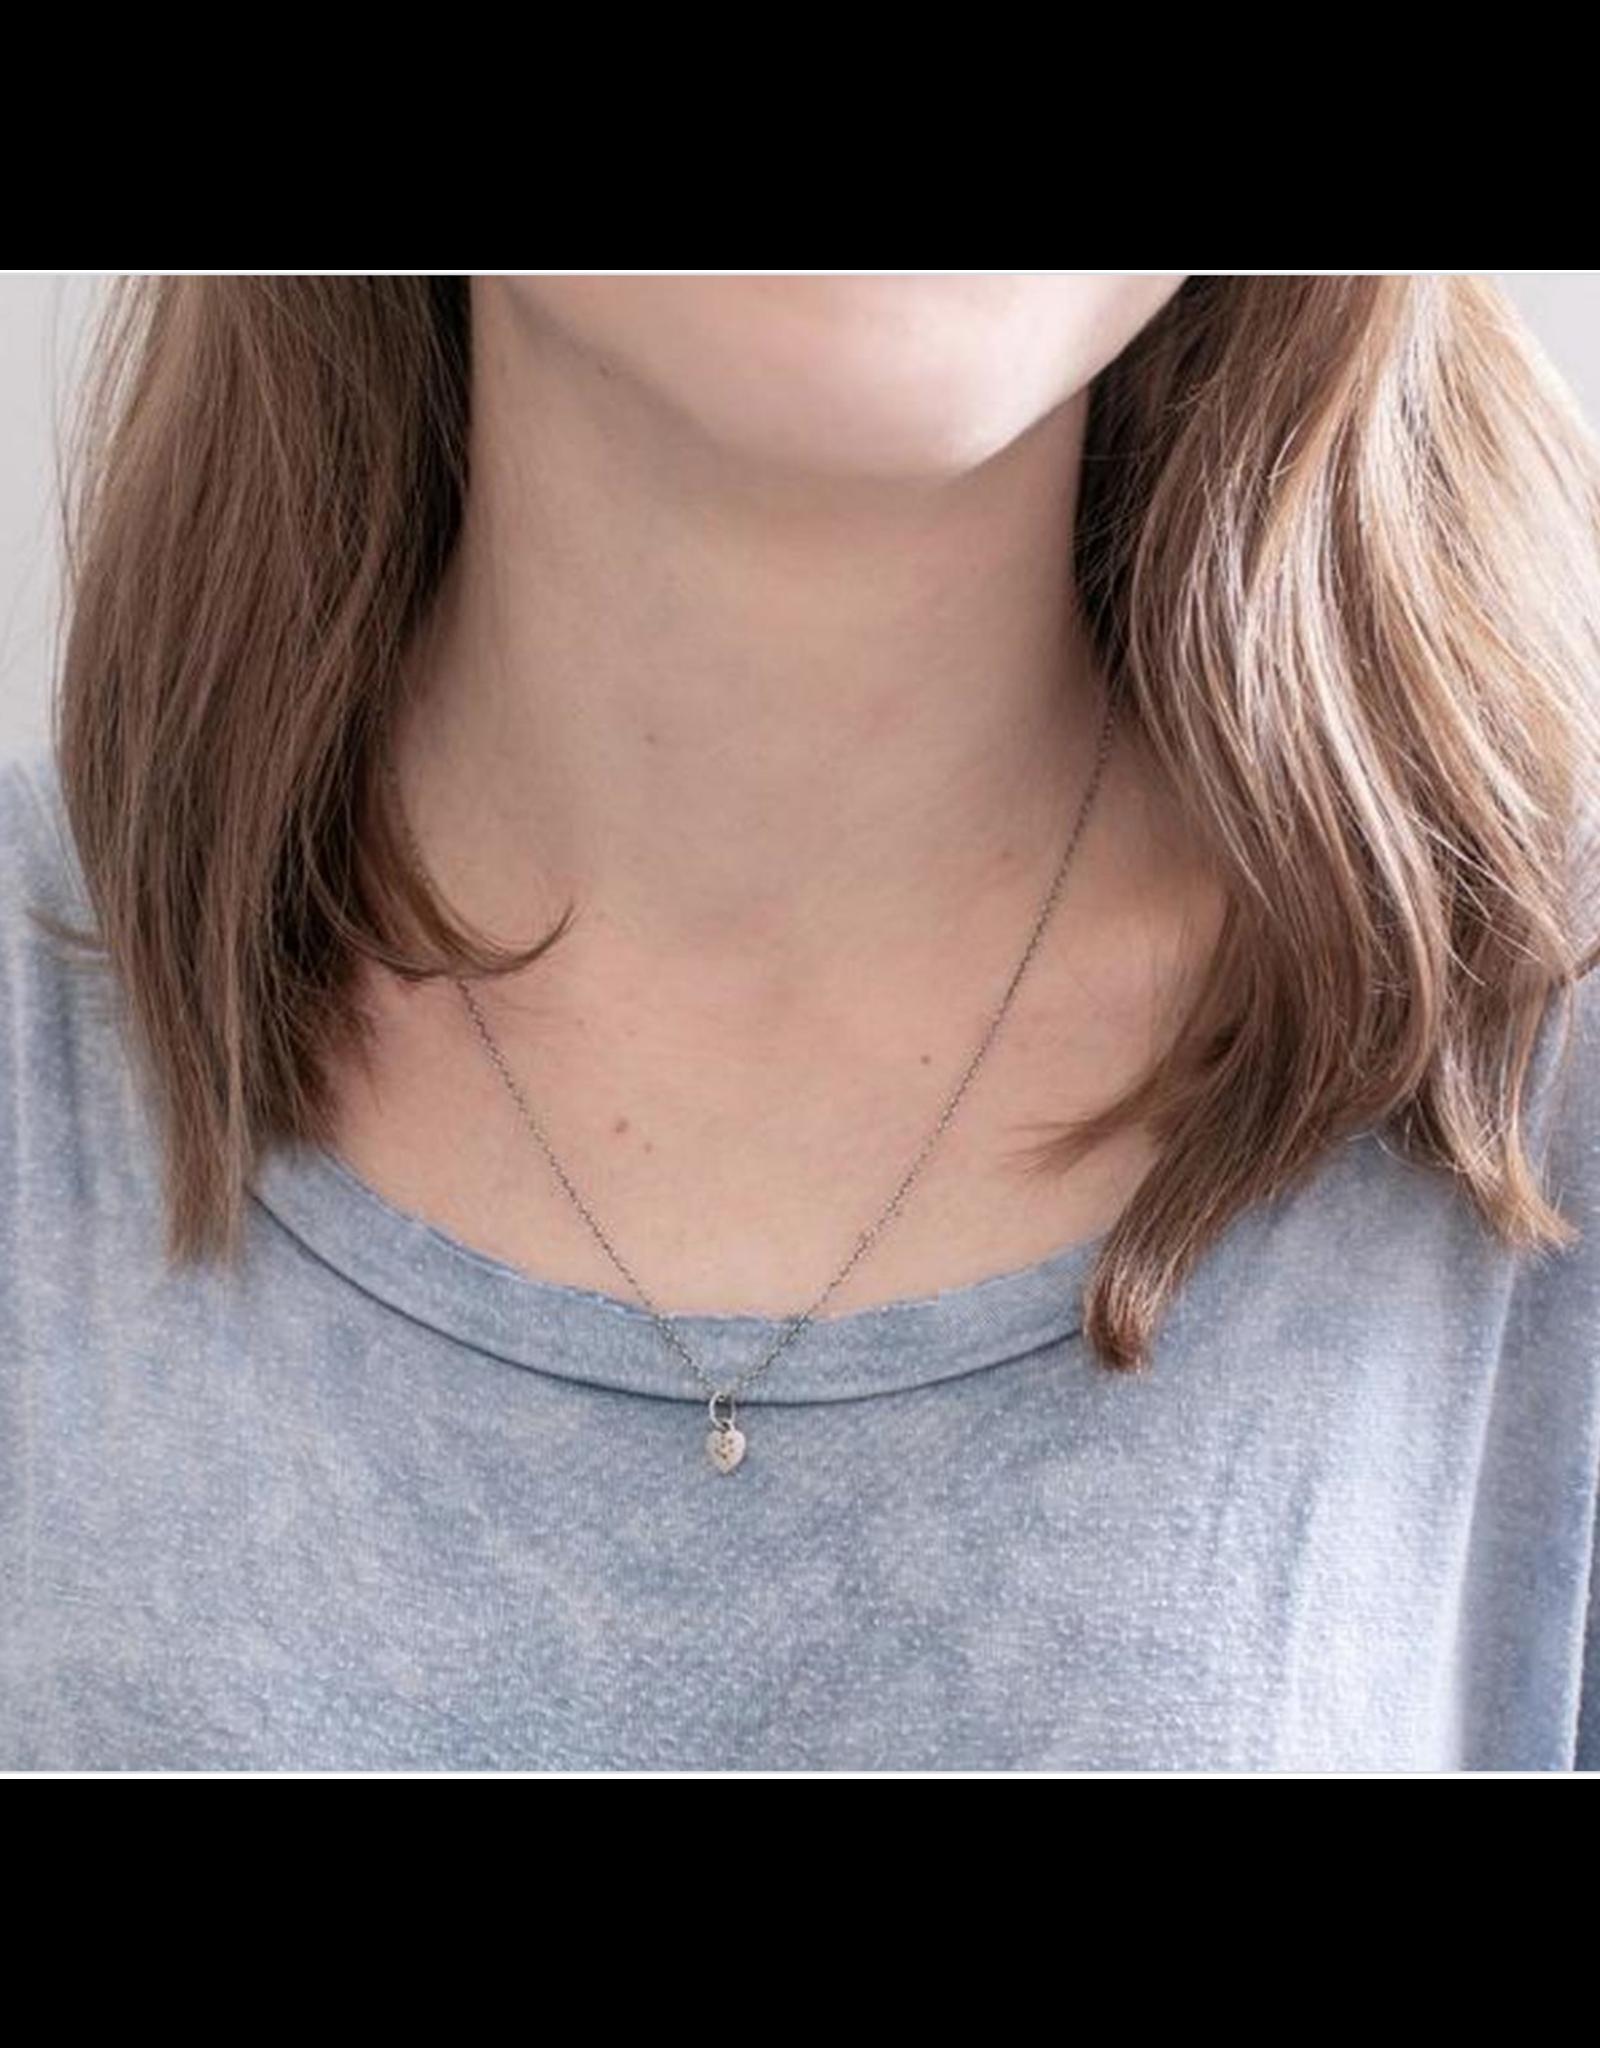 Heart Necklace w/White Topaz